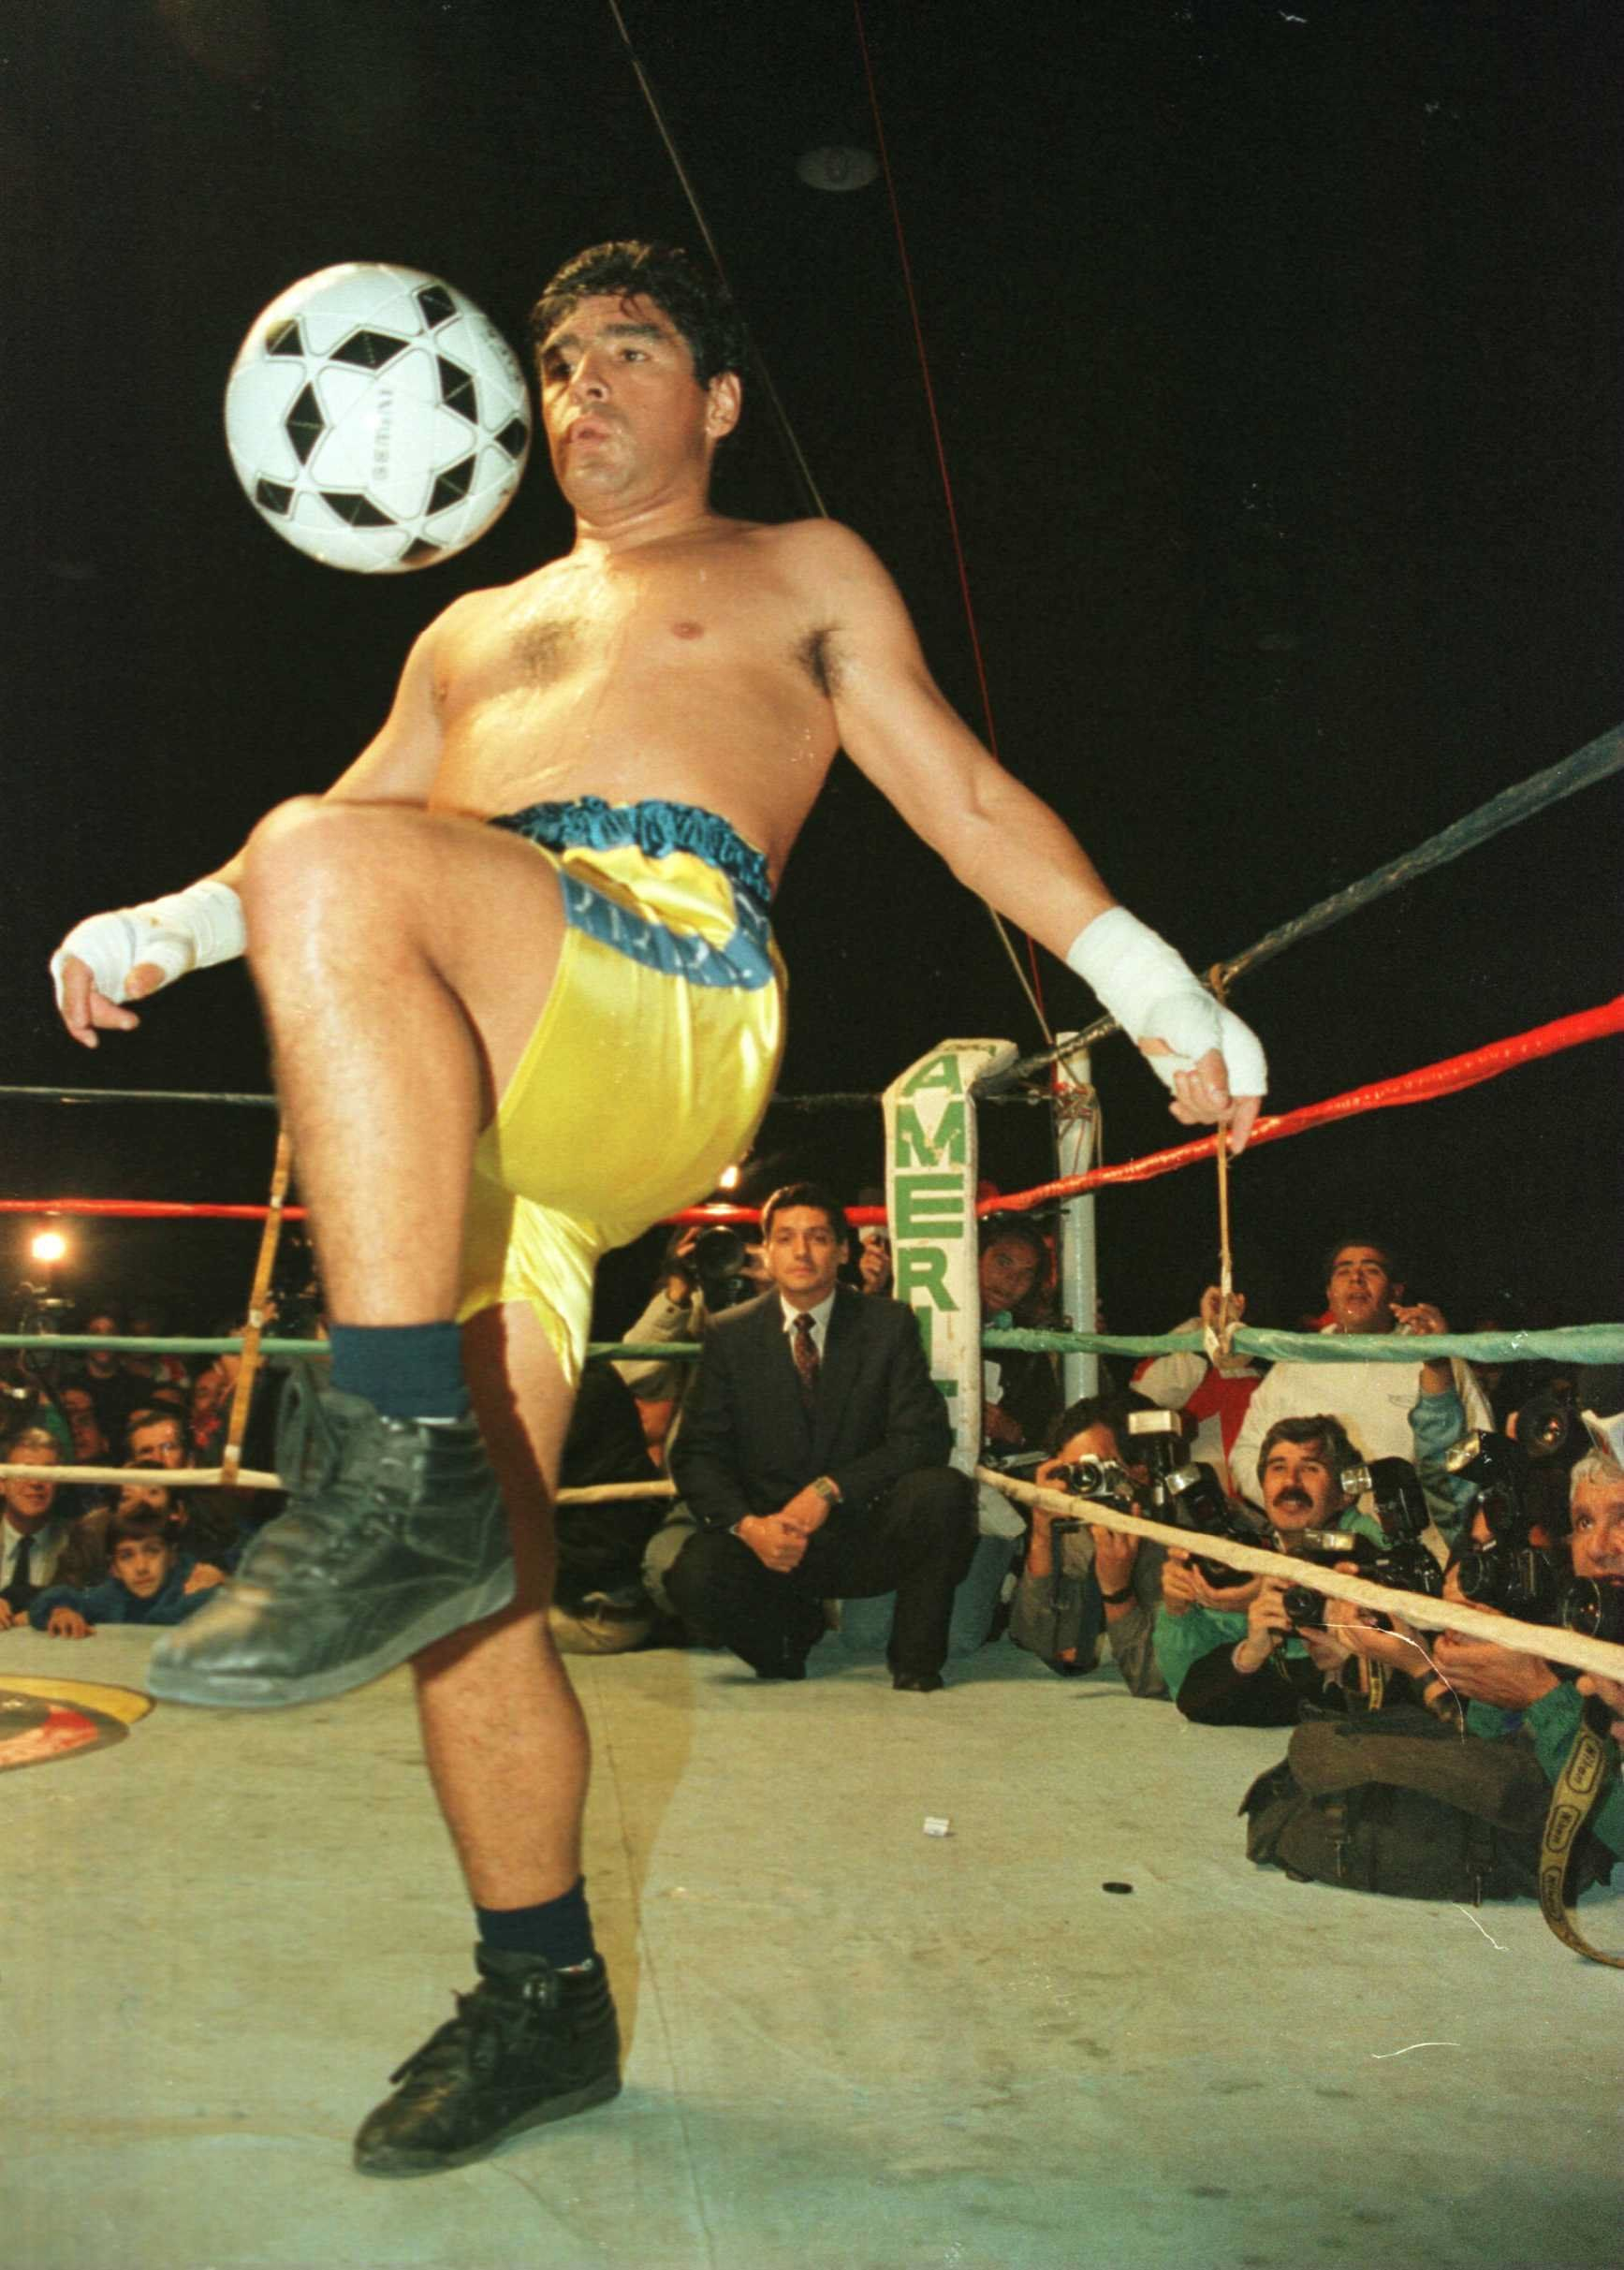 Символ футбола. ФОТО галерея памяти Диего Марадоны - фото 1